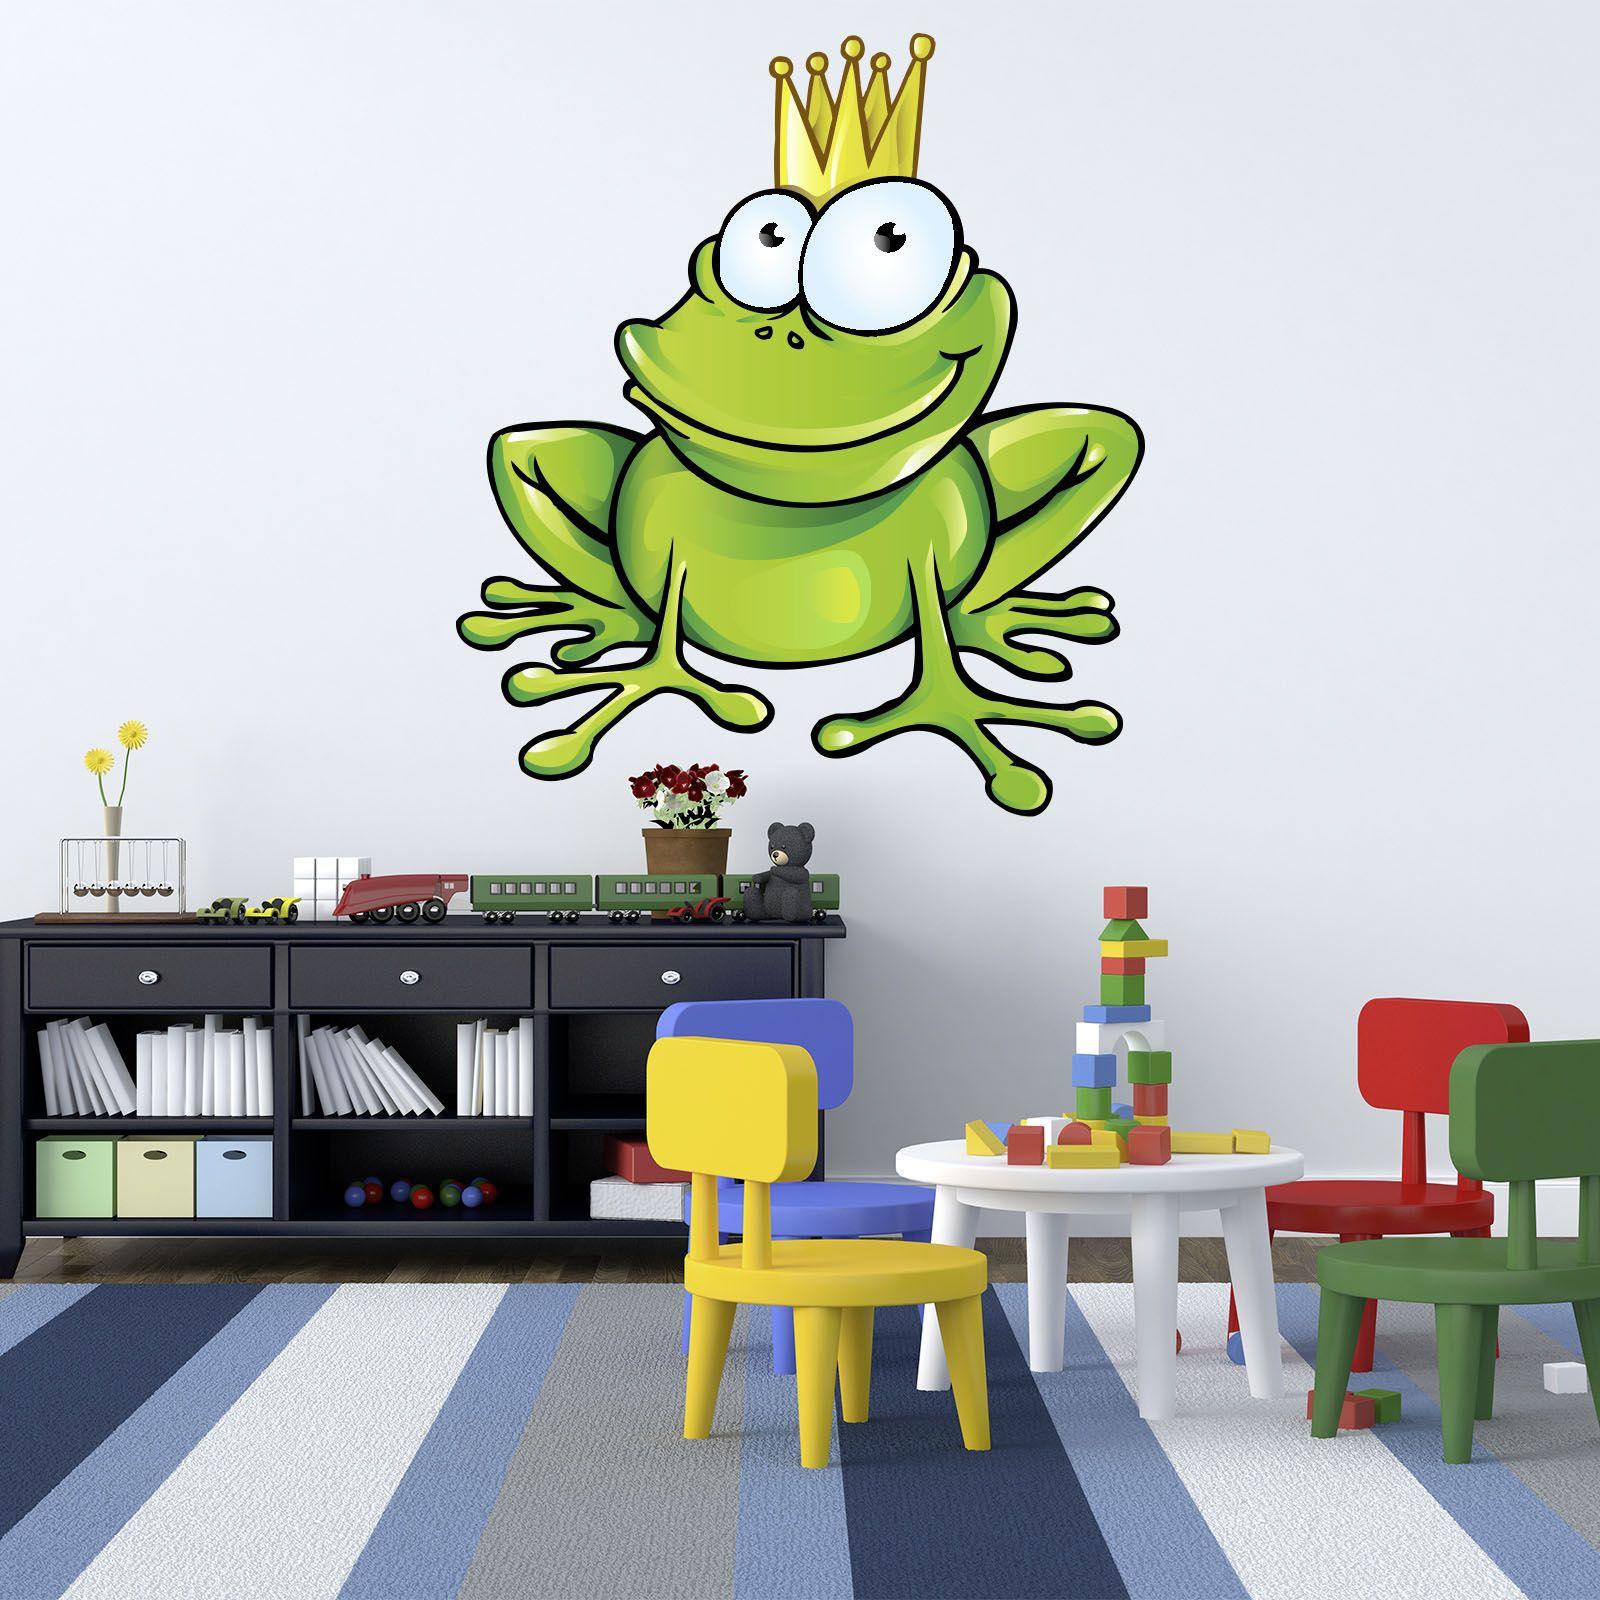 xxl wallprint wandtattoo frosch k nig froschk nig krone. Black Bedroom Furniture Sets. Home Design Ideas